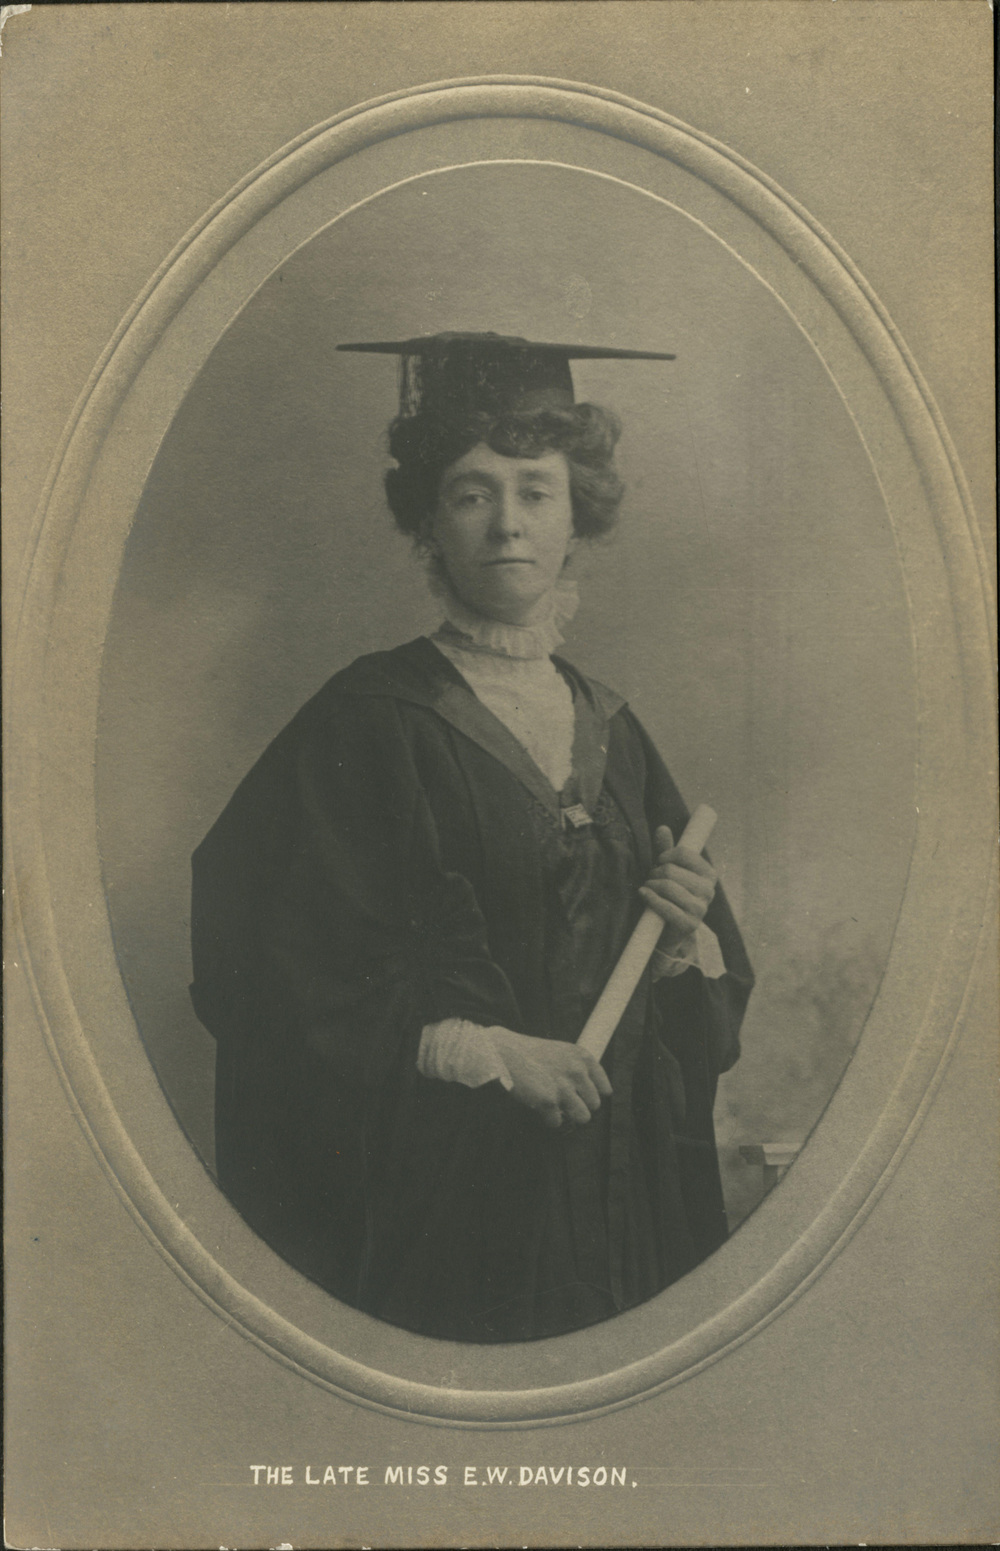 The late Miss E.W. Davison